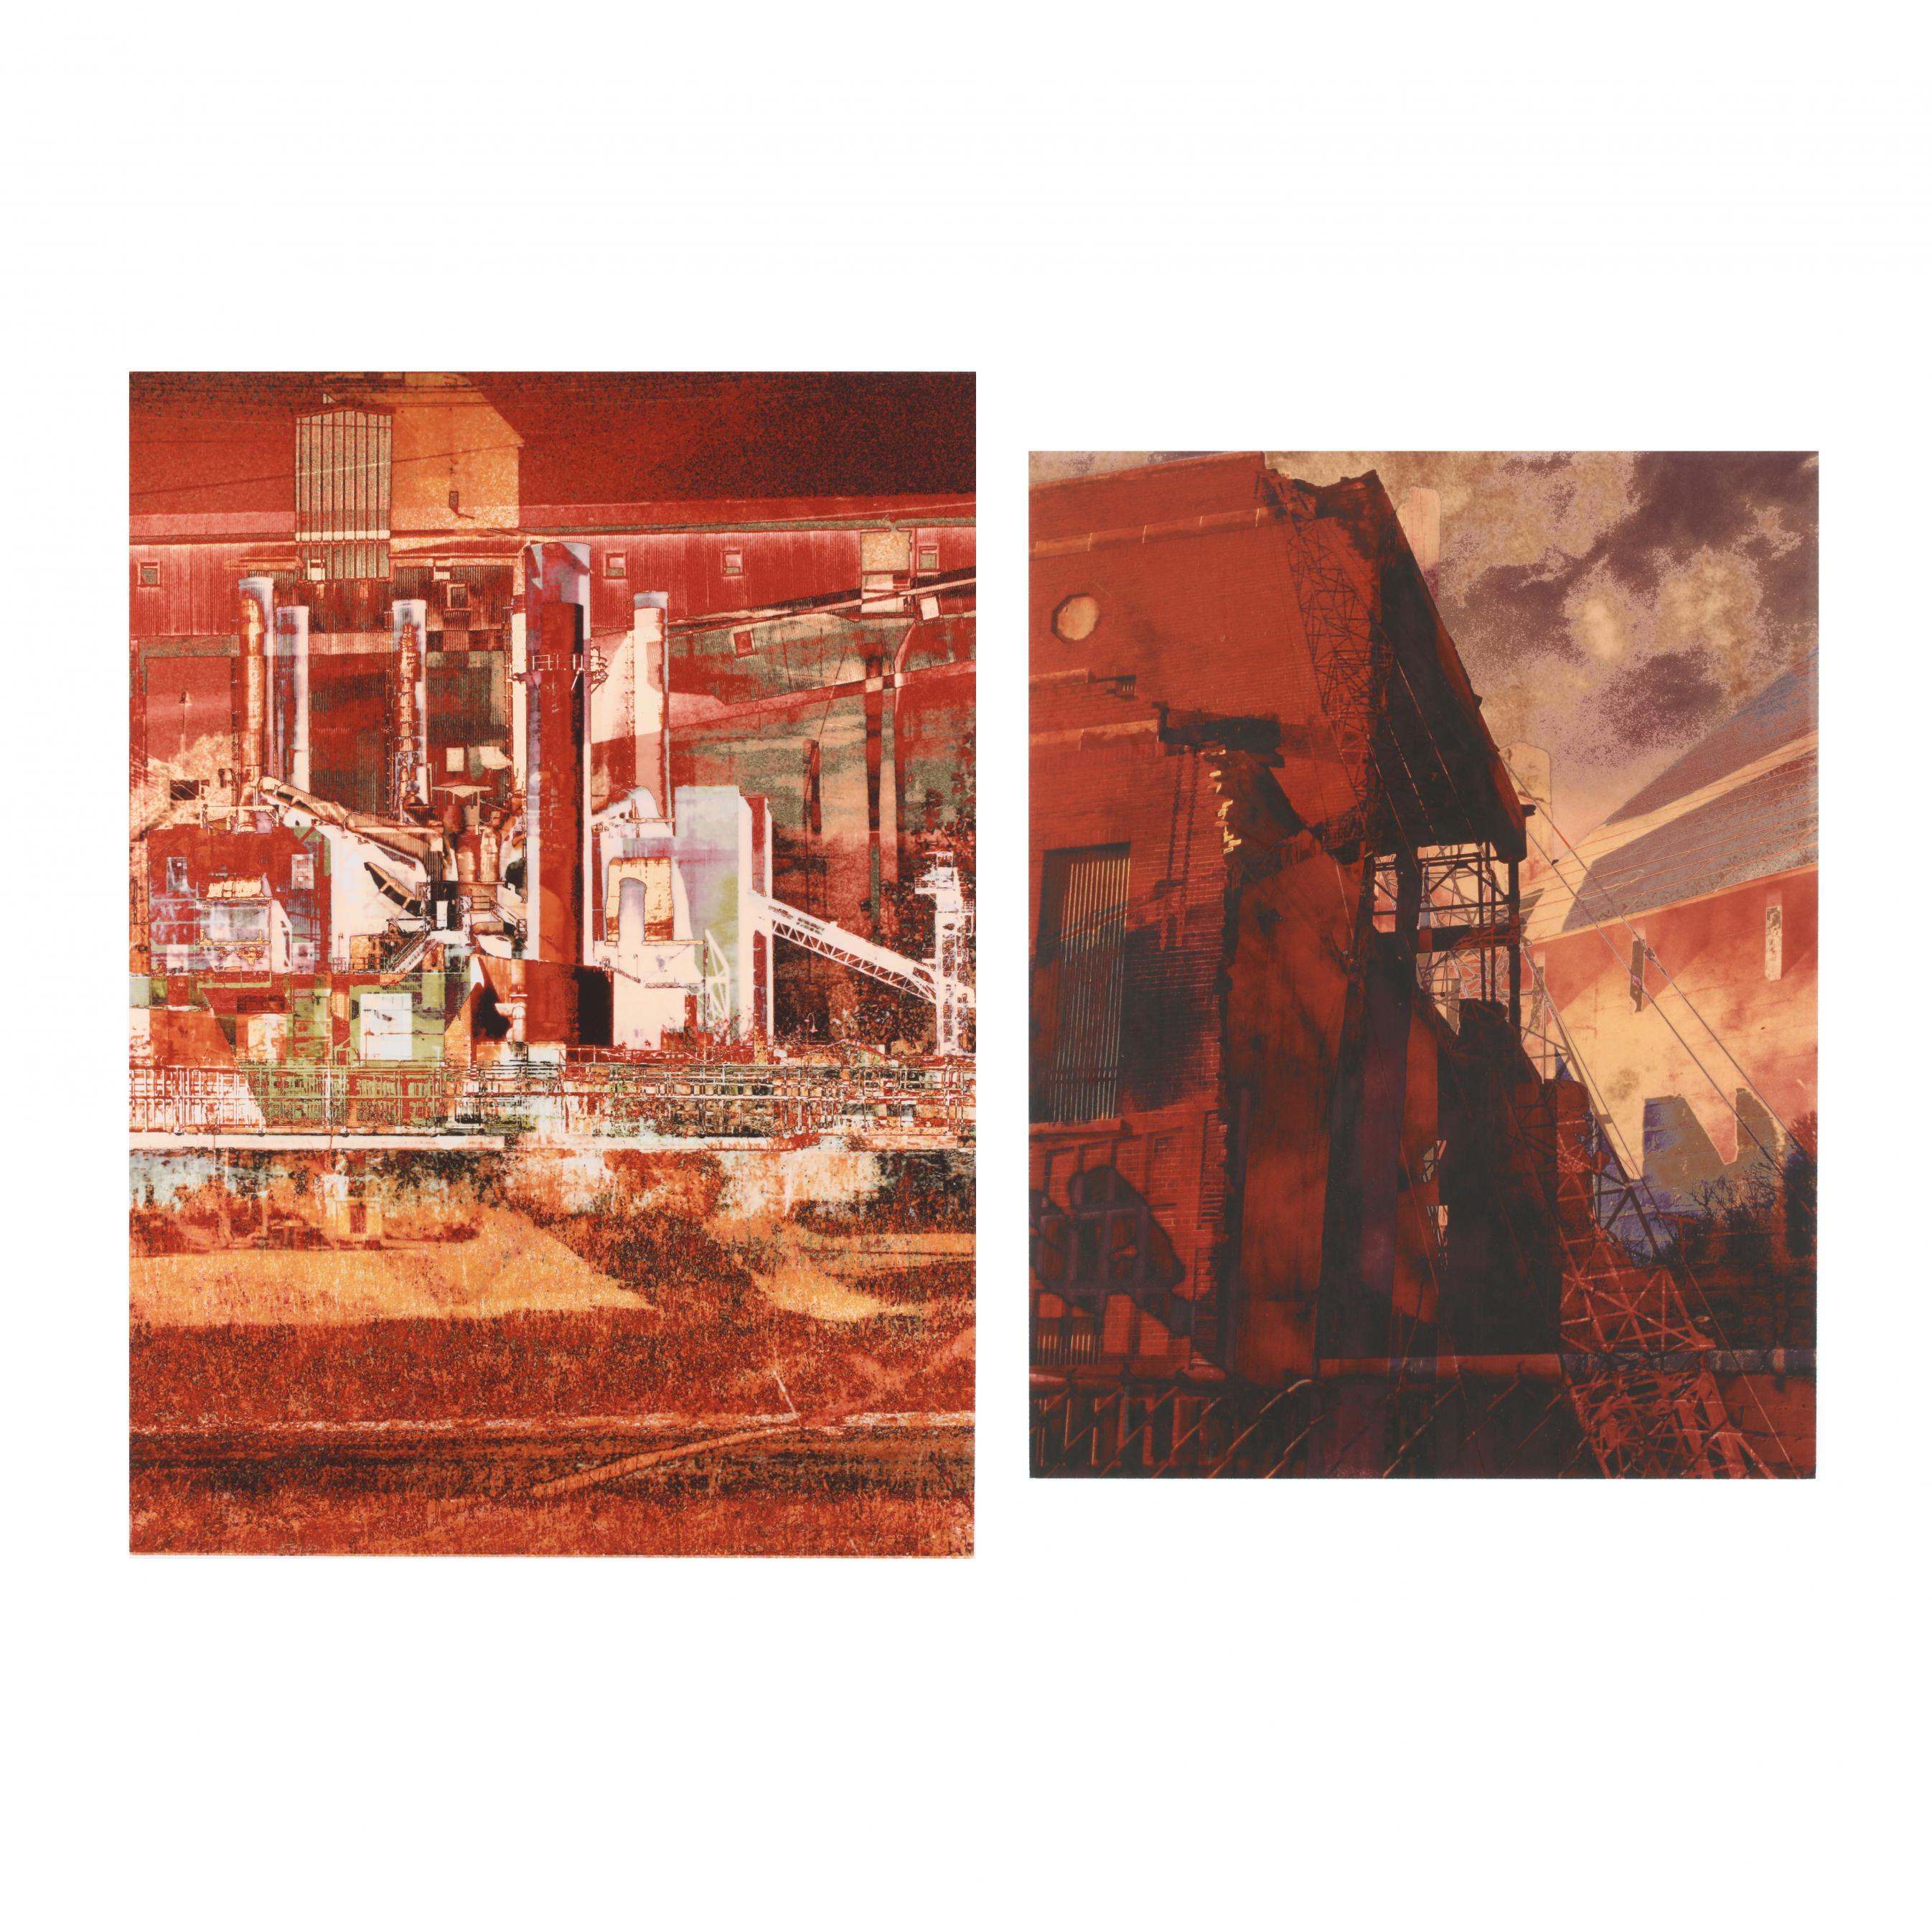 chris-foley-nc-two-large-framed-prints